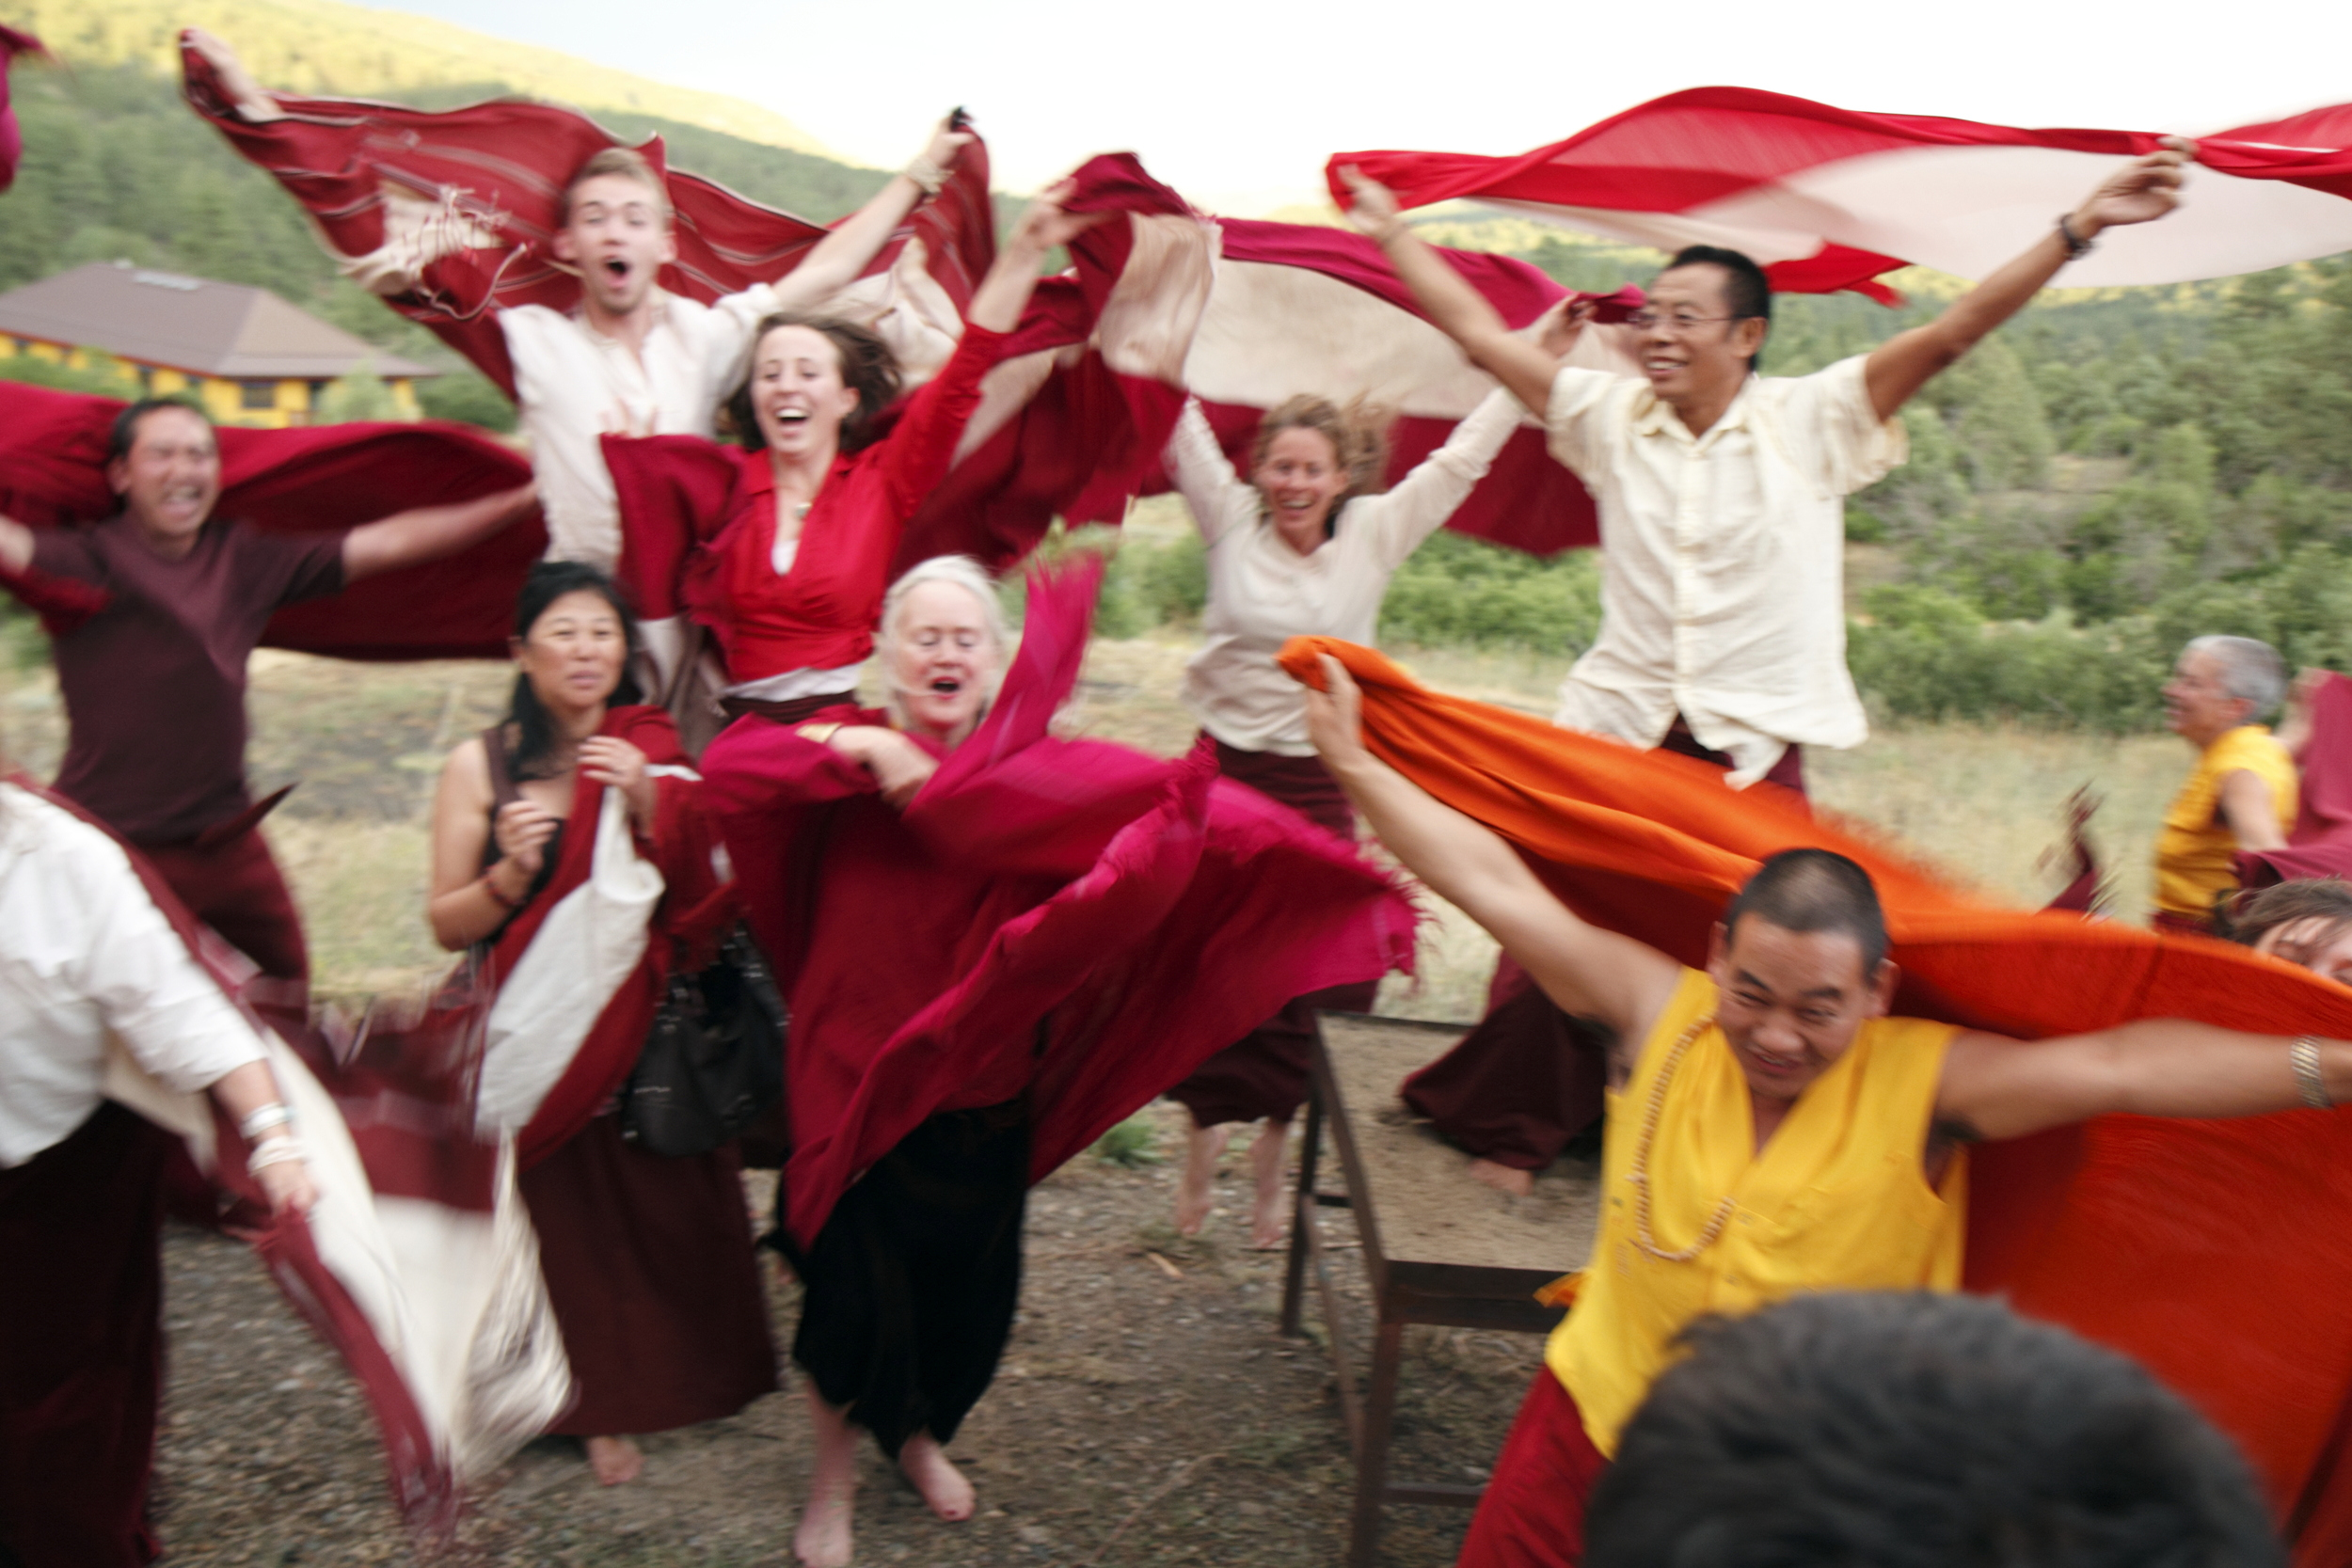 A joyful celebration at Tara Mandala